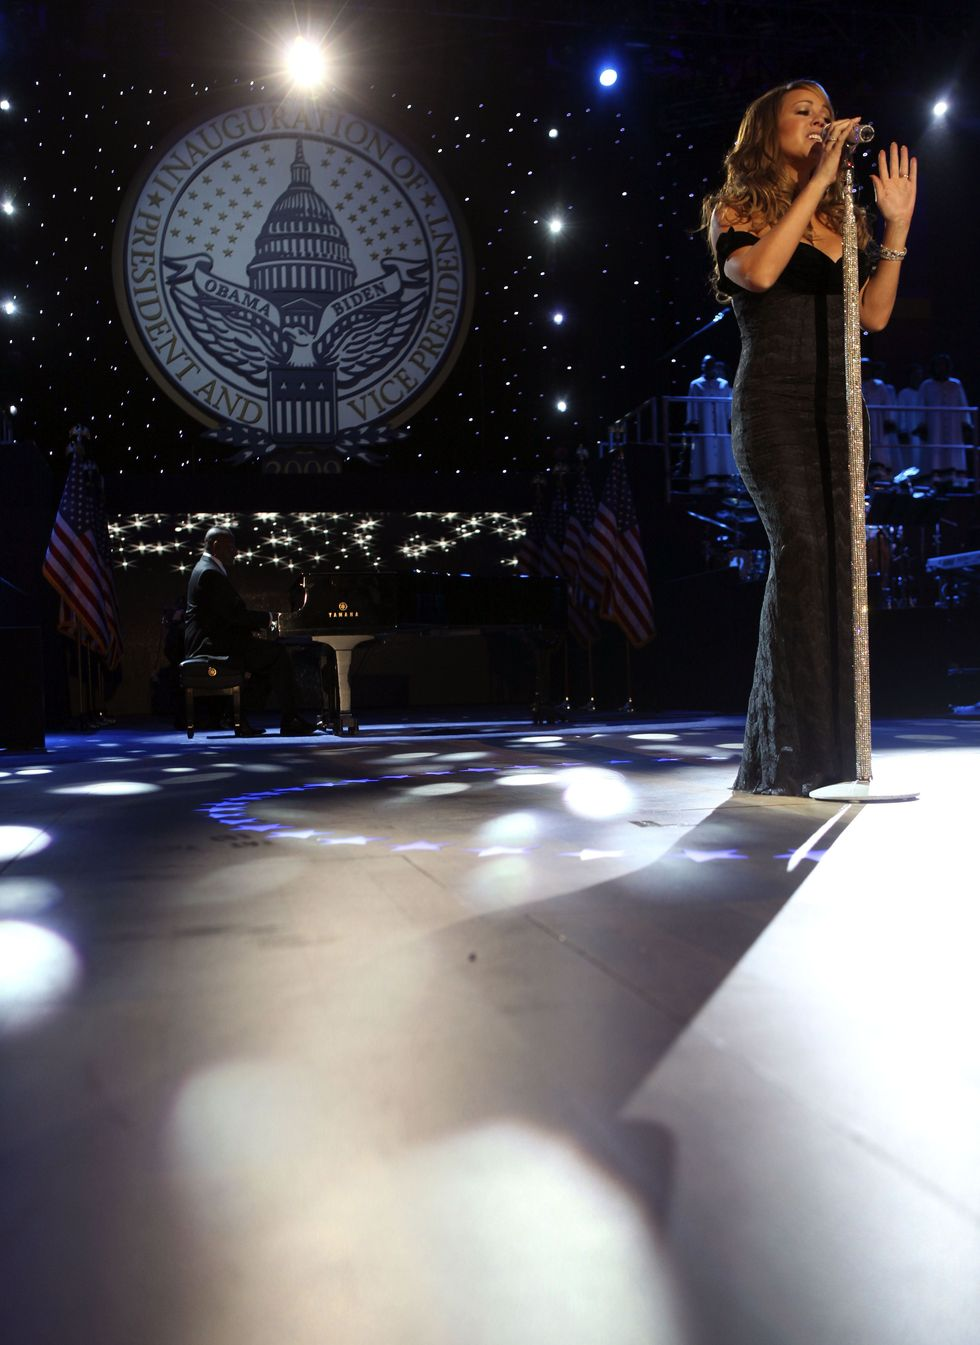 mariah-carey-performs-at-the-neighborhood-inaugural-ball-in-washington-01